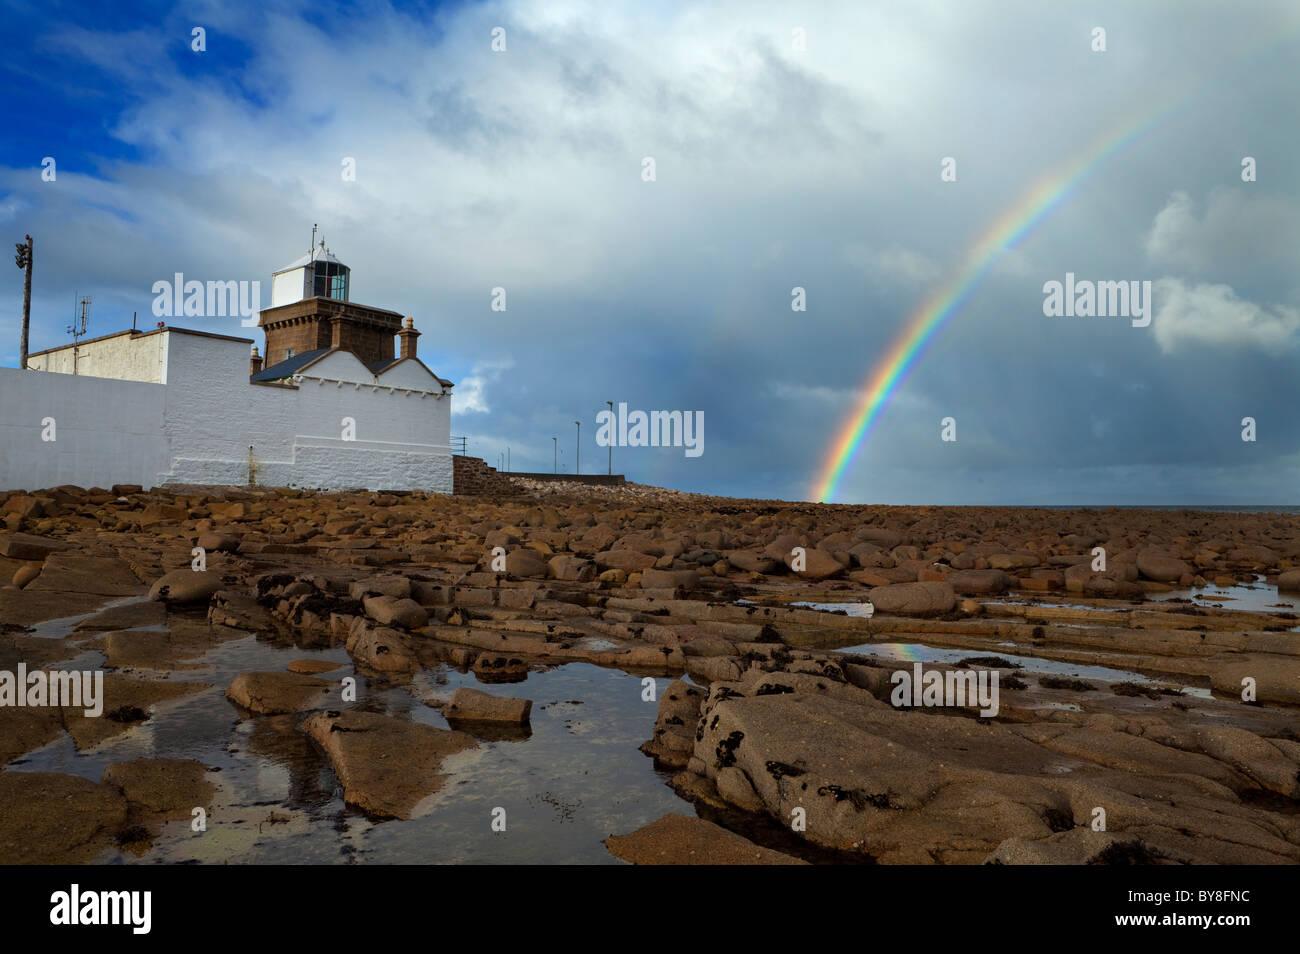 Rainbow Over the Lighthouse at Doonbeg Point, The Mullet Penninsula, County Mayo, Ireland - Stock Image